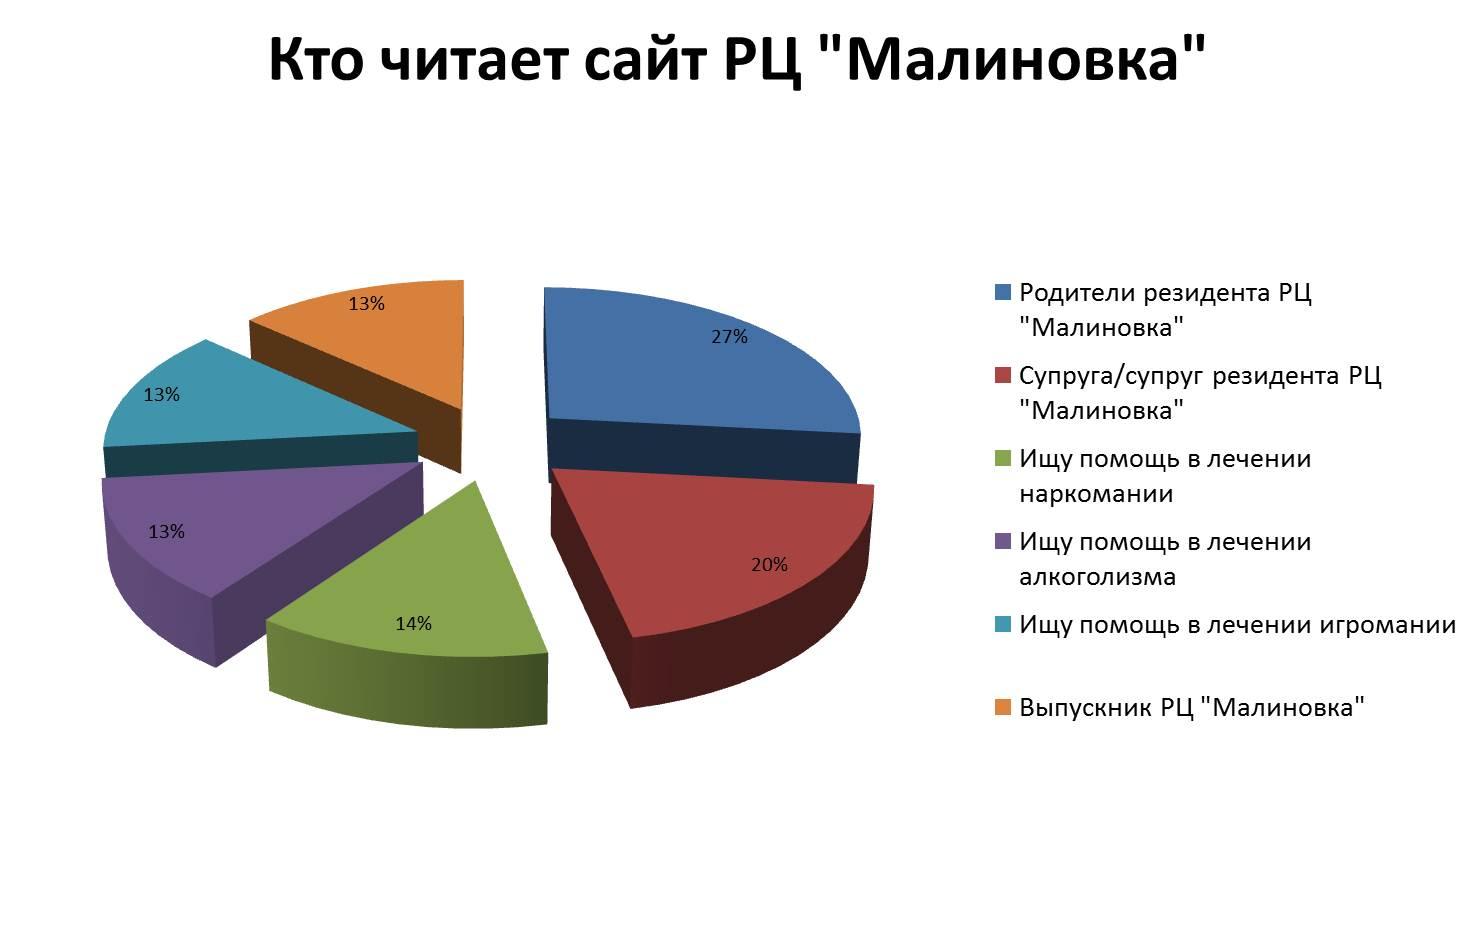 Аудитория сайта РЦ Малиновка